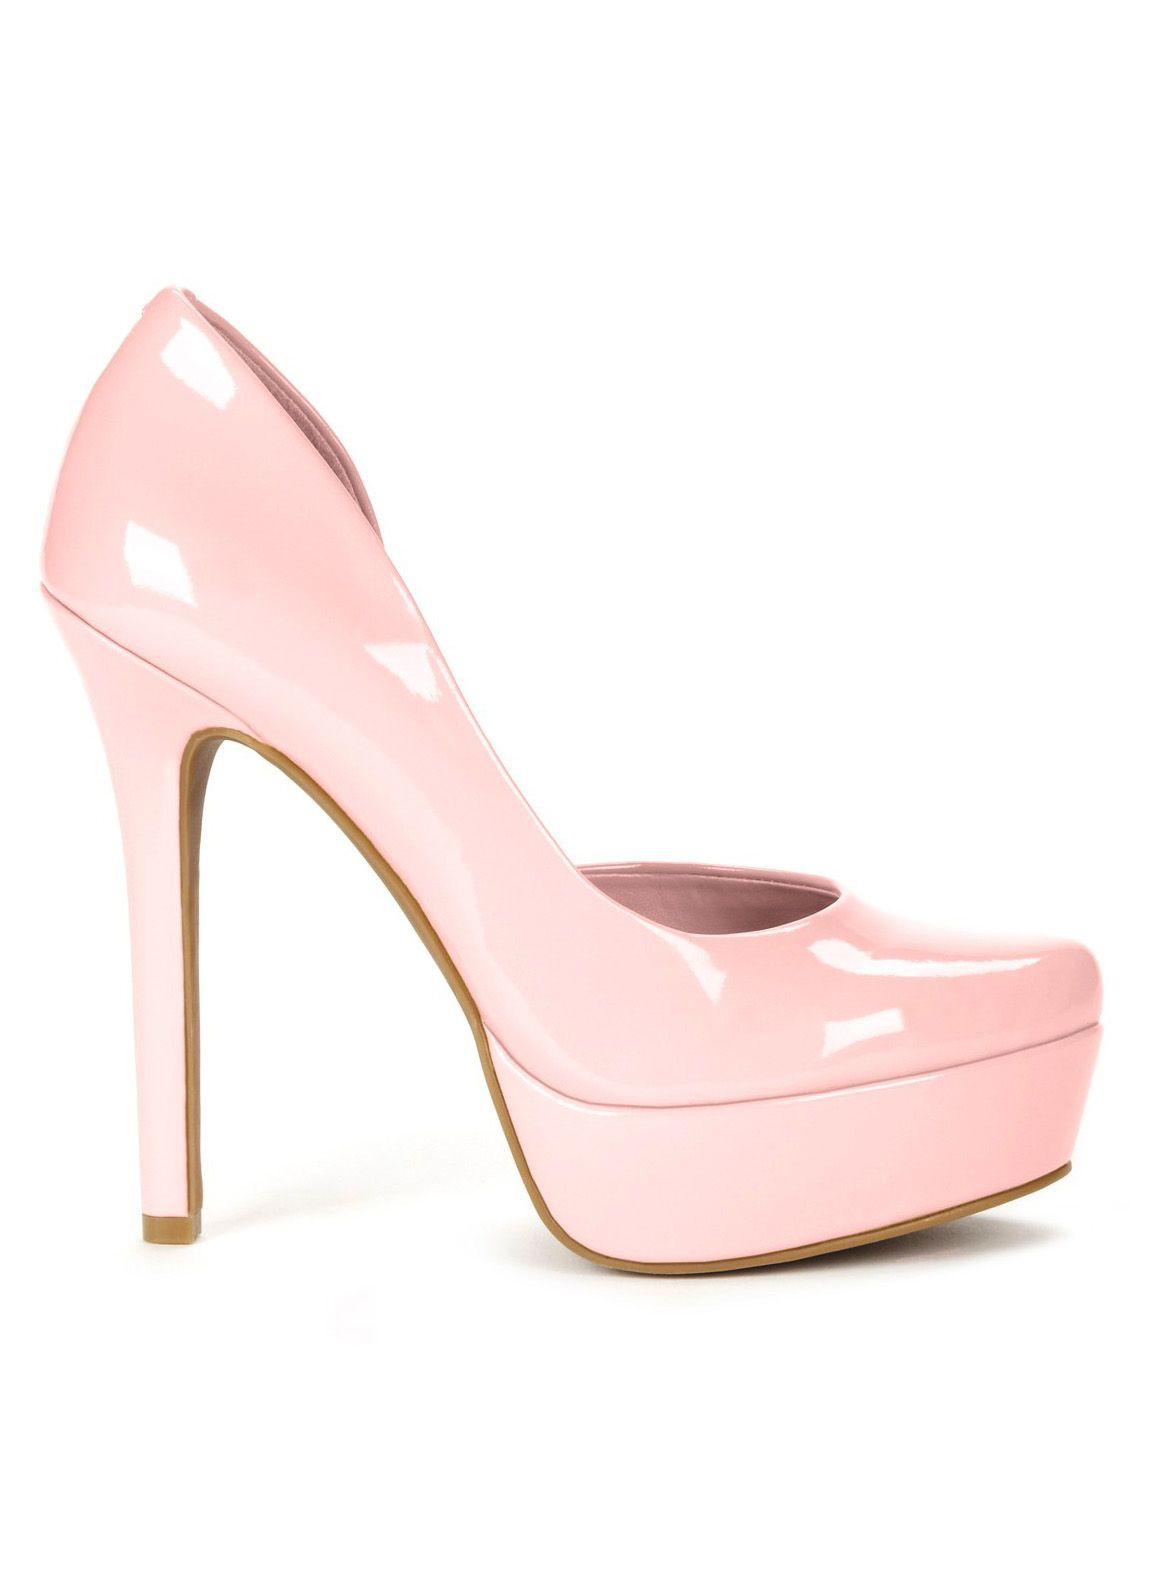 41b1a3b569c Blush Pink Platform Heels | style | Shoes, Shoe boots, Pink shoes